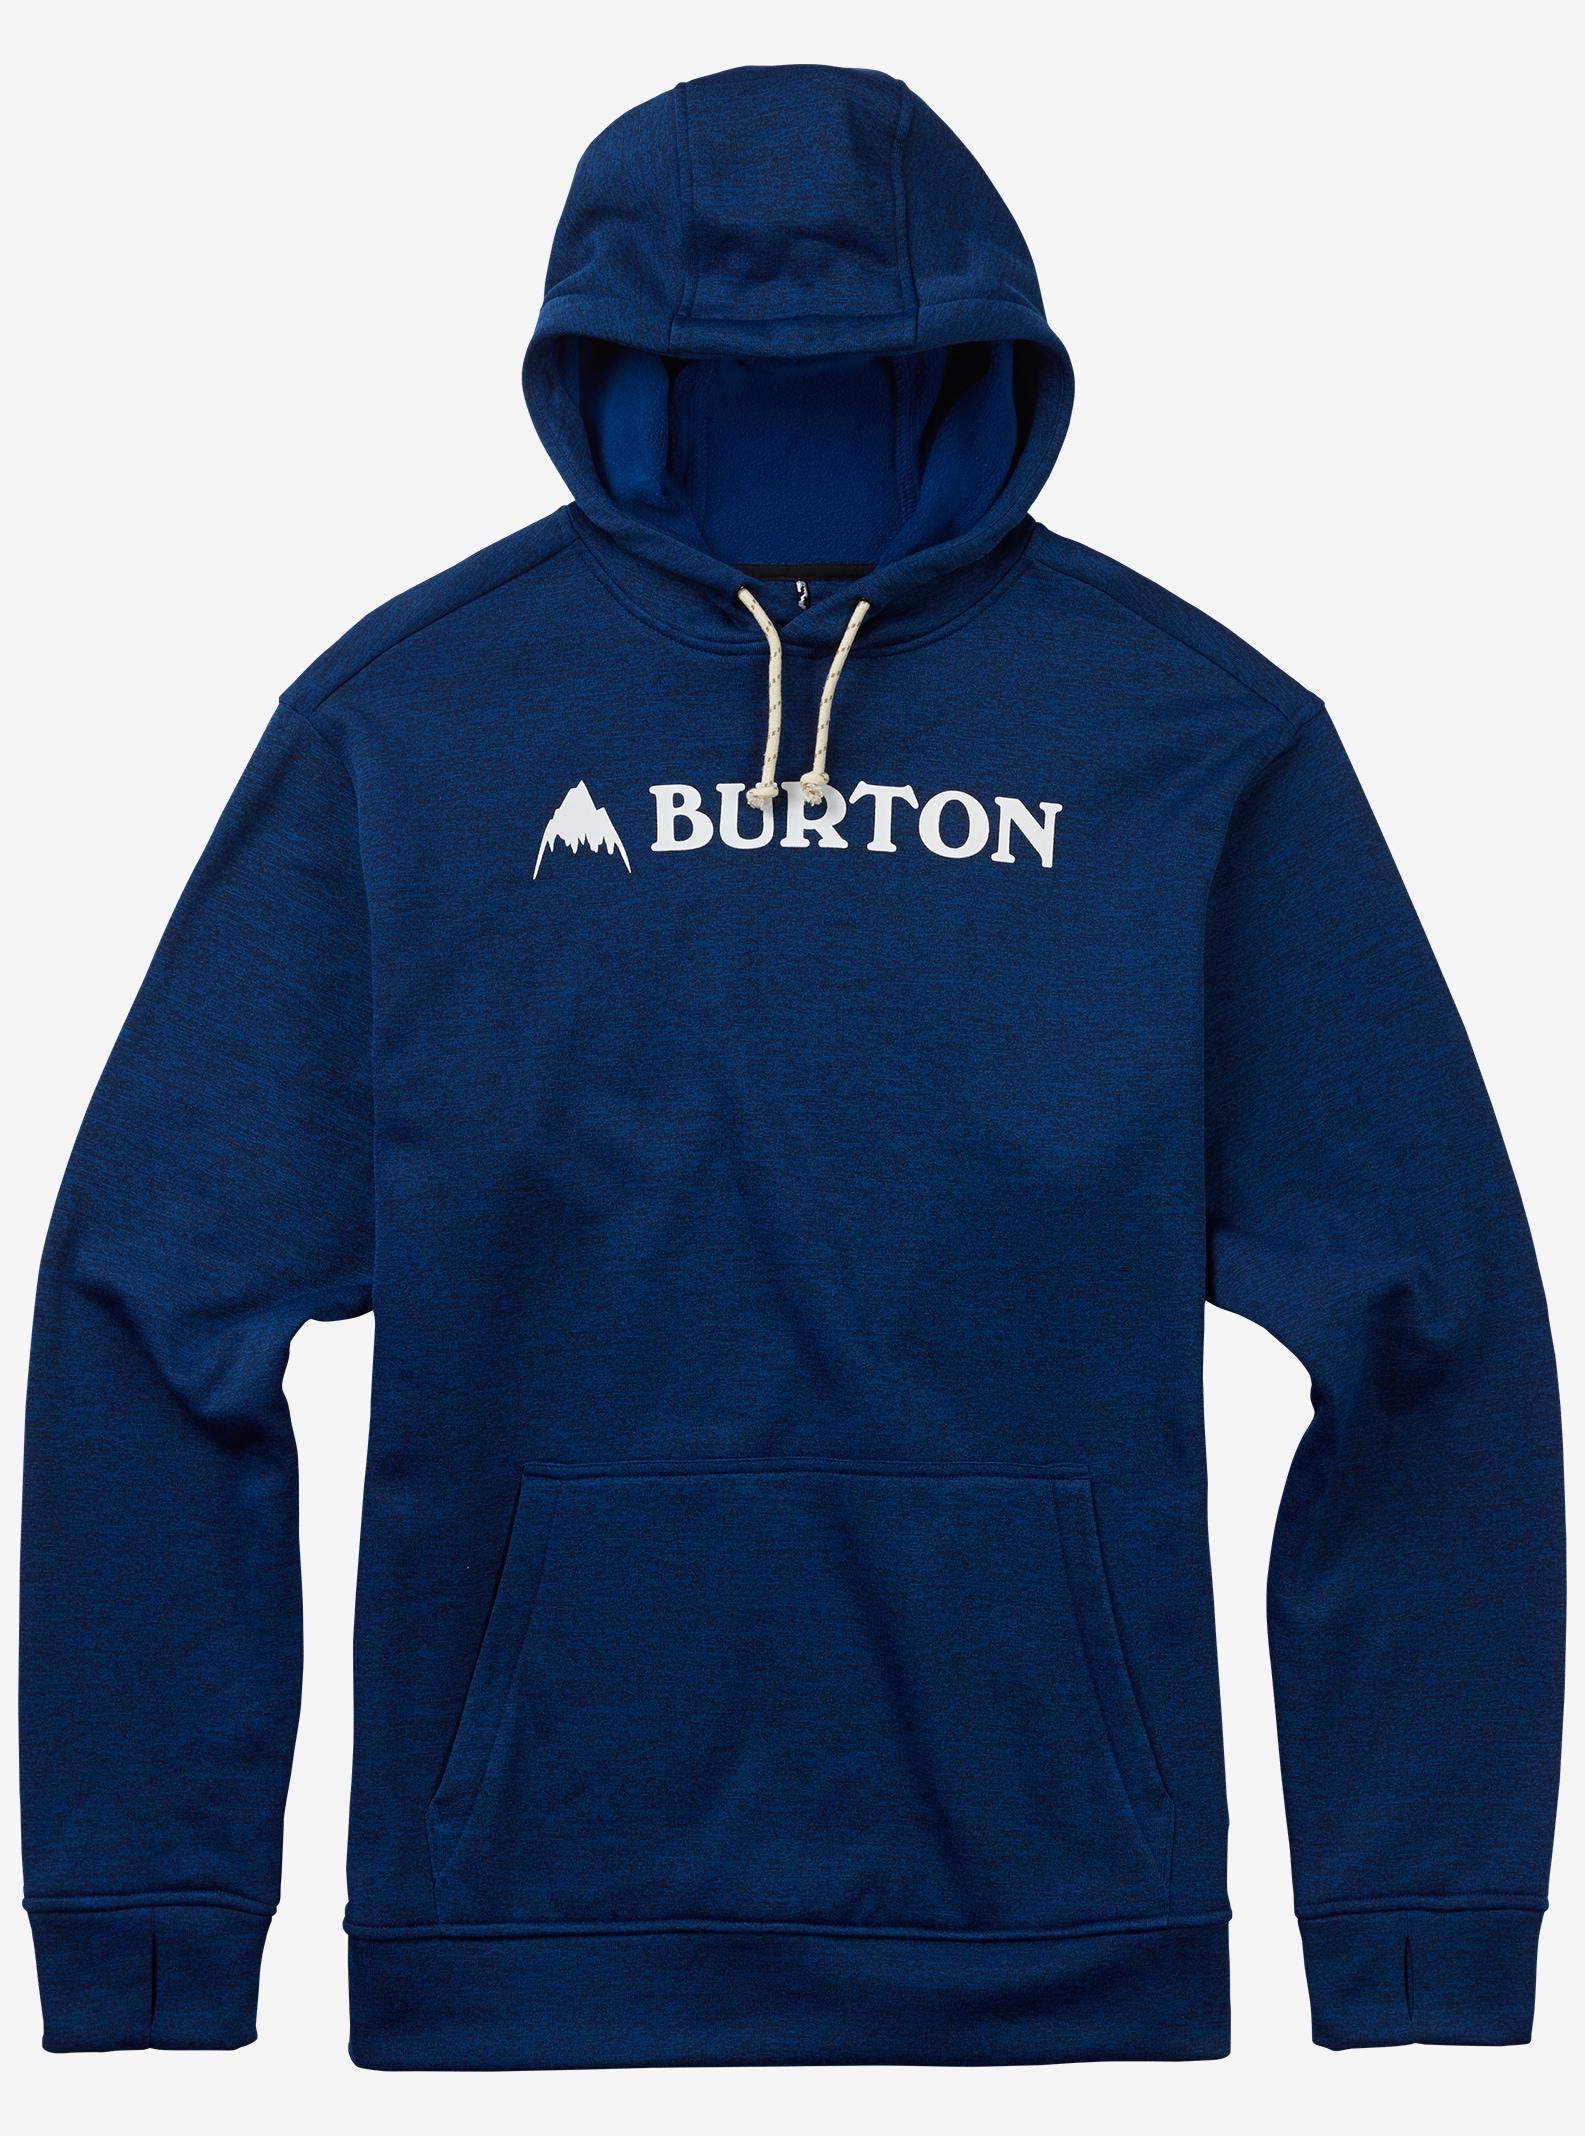 Burton Oak Pullover Hoodie shown in True Blue Heather